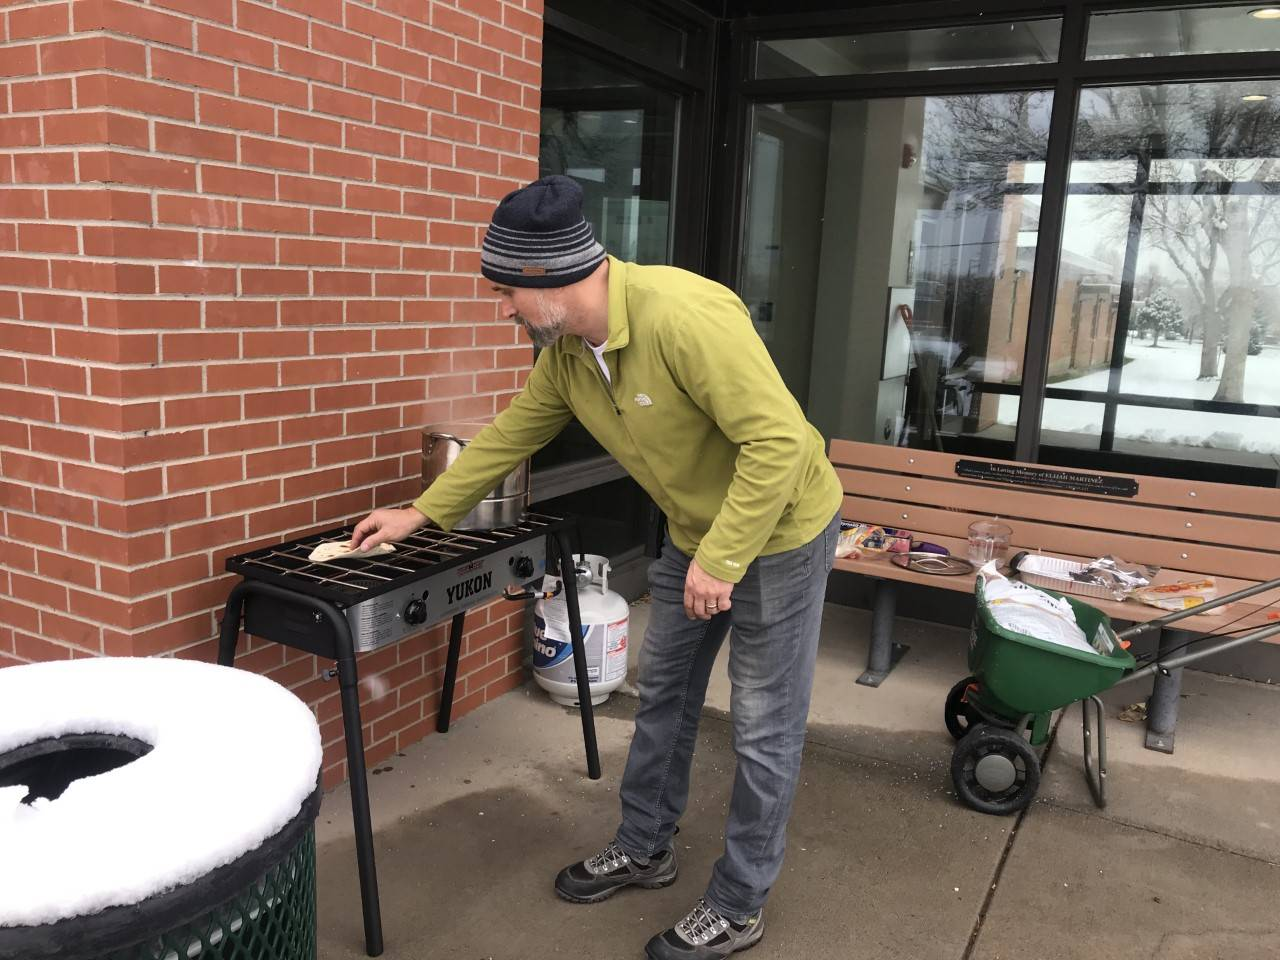 Joe warming up Pasole and tortillas